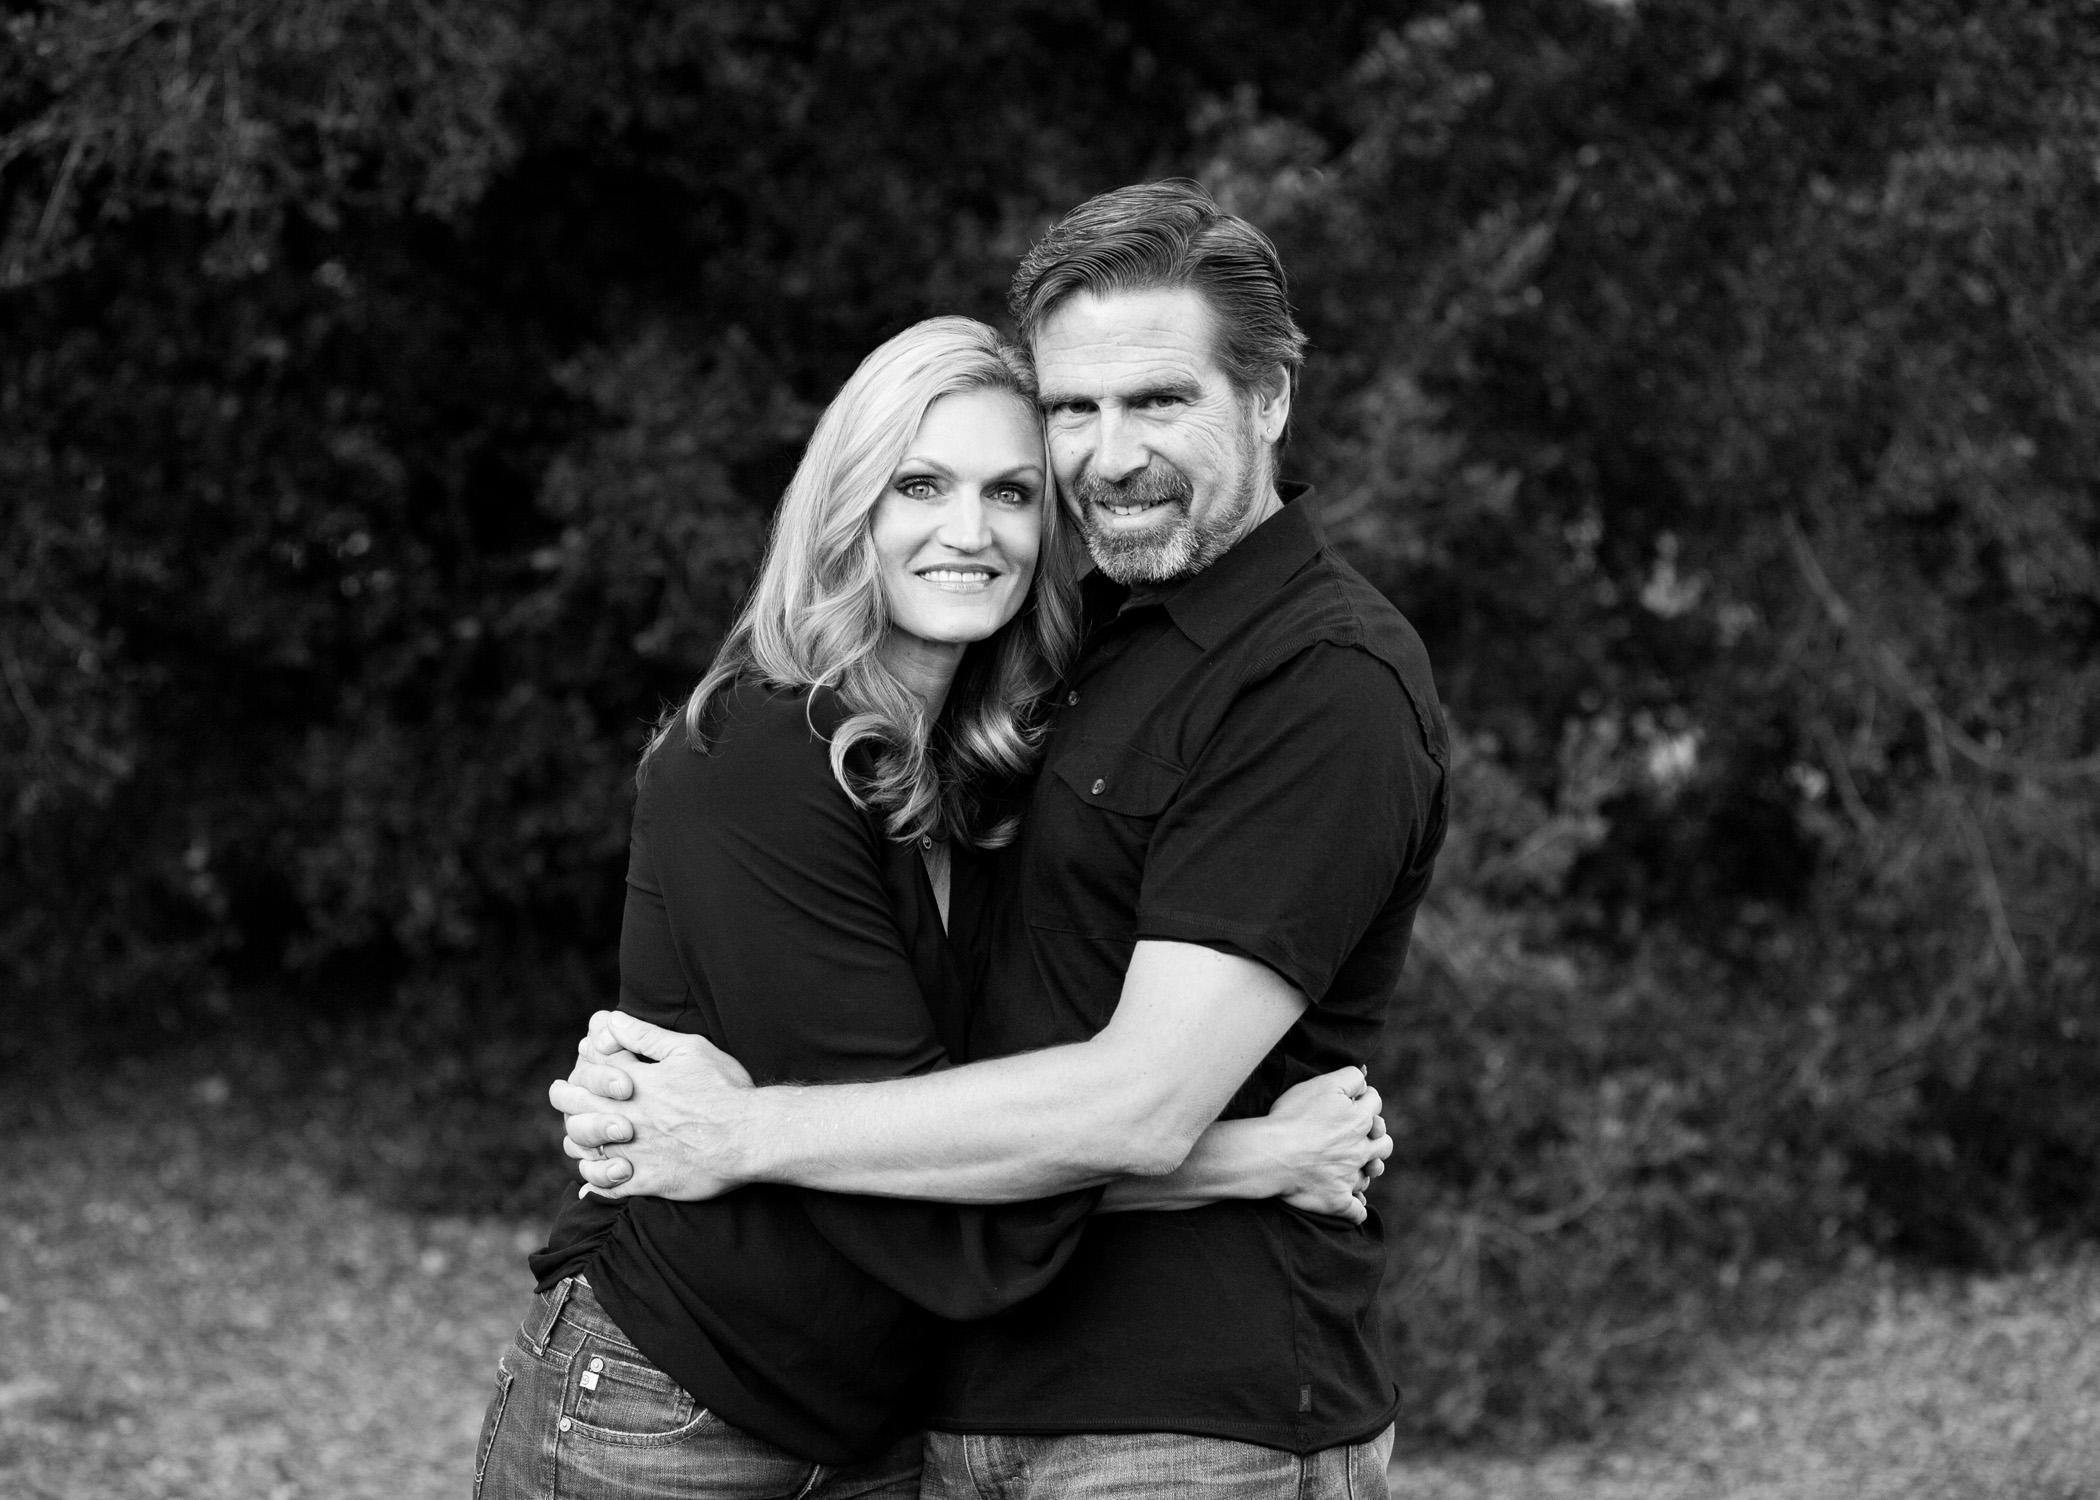 black and white couple portrait at park